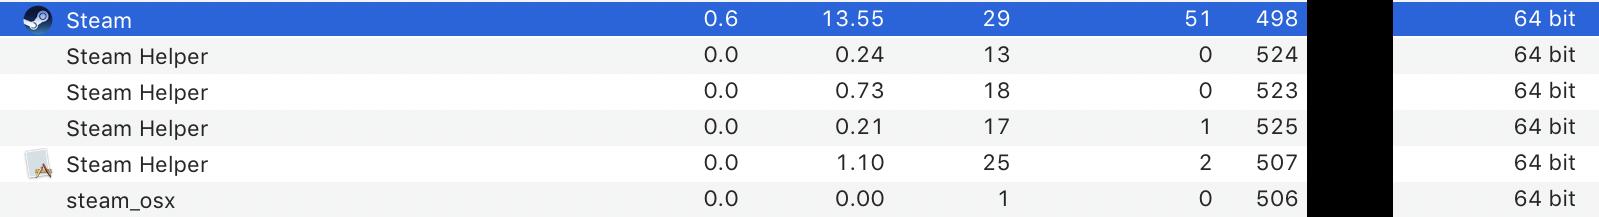 64 bit client for steam